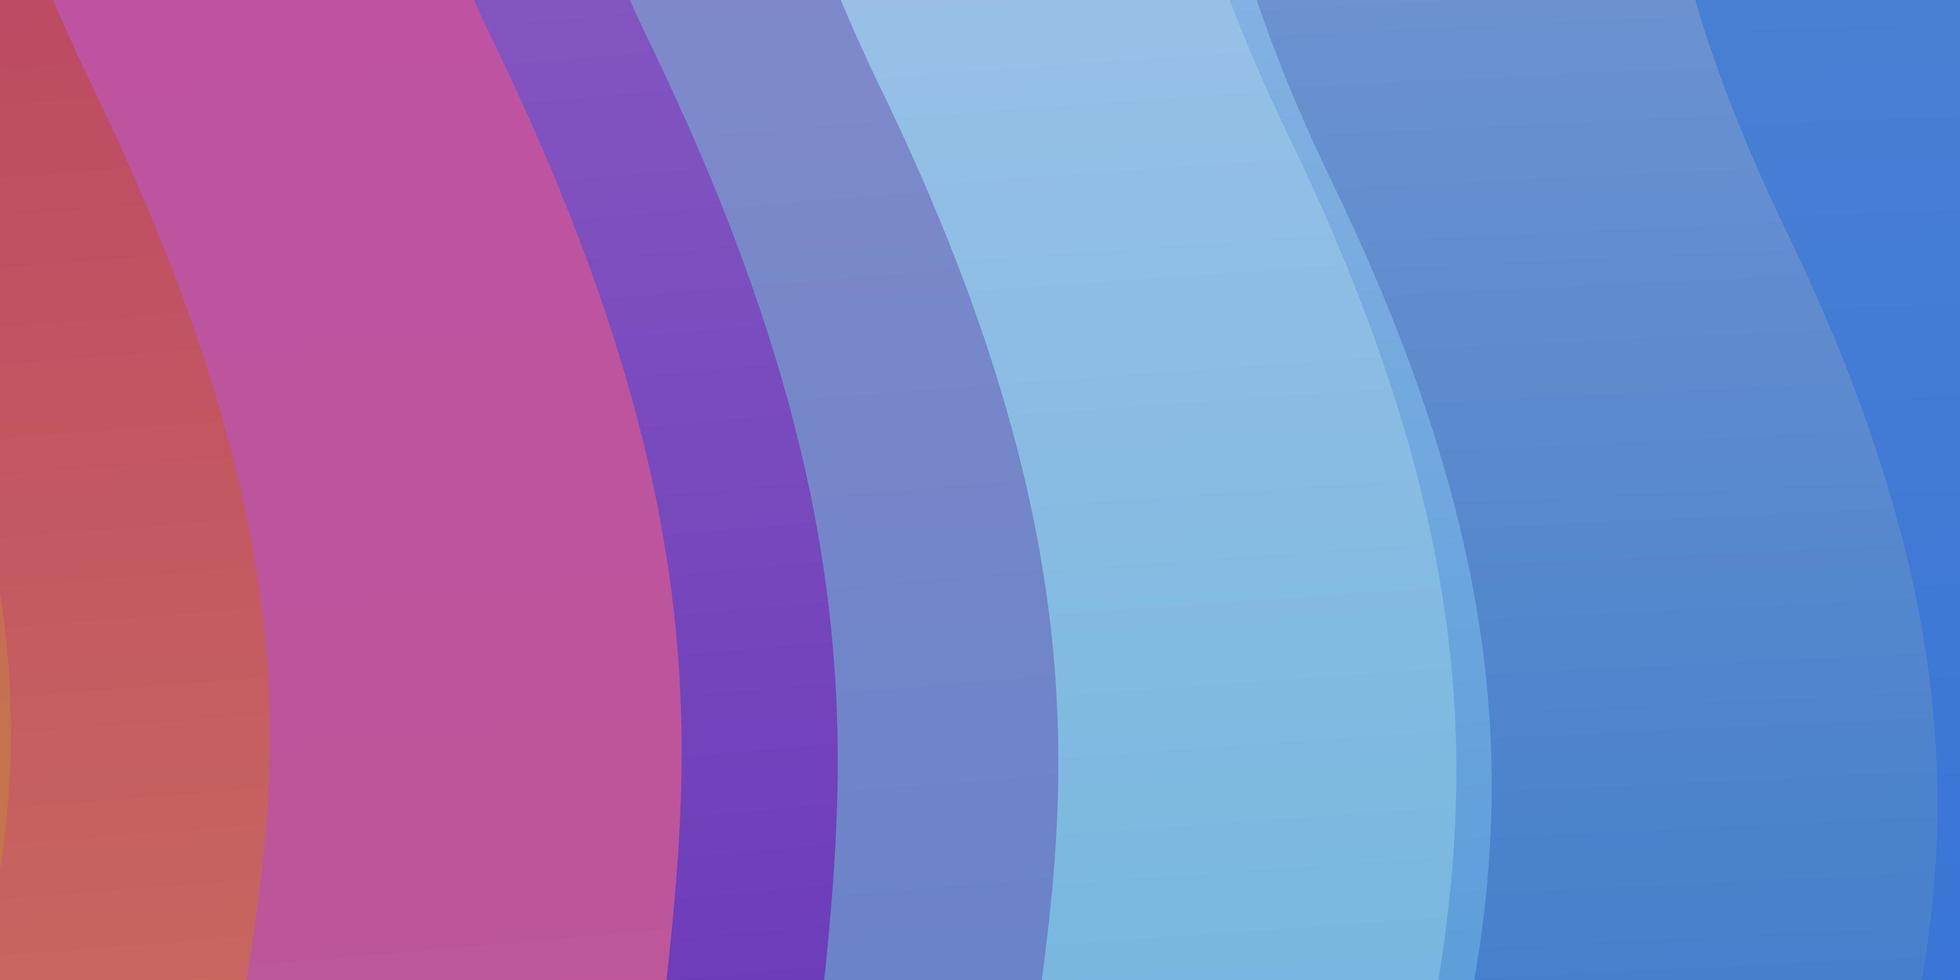 patrón de vector azul claro, rojo con líneas torcidas.